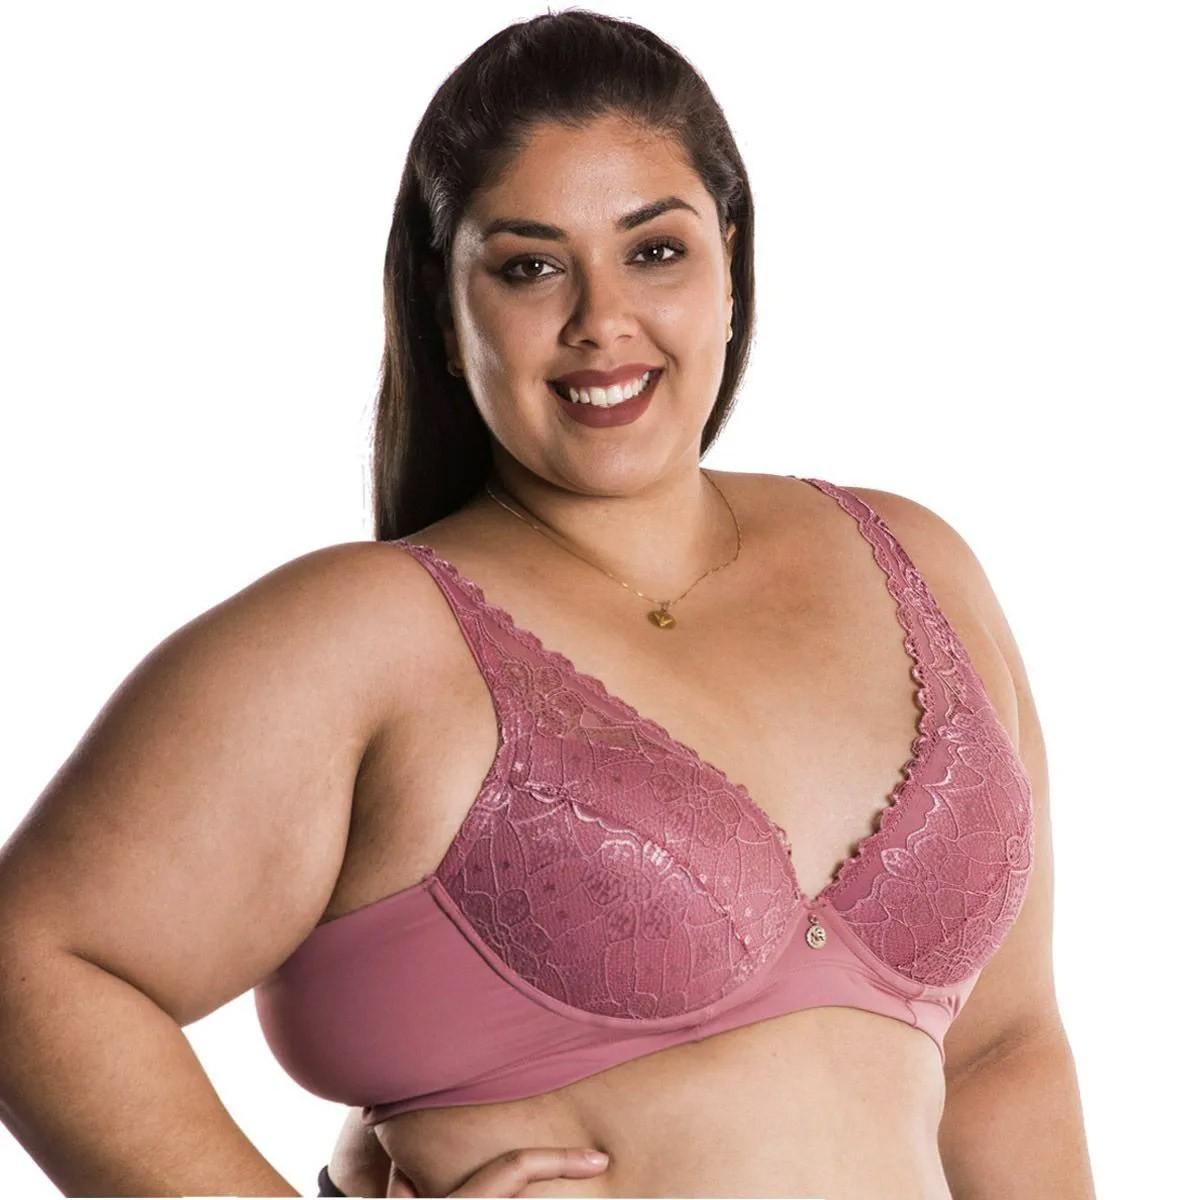 Sutiã Plus Size Em Renda Com Bojo Nayane Rodrigues .